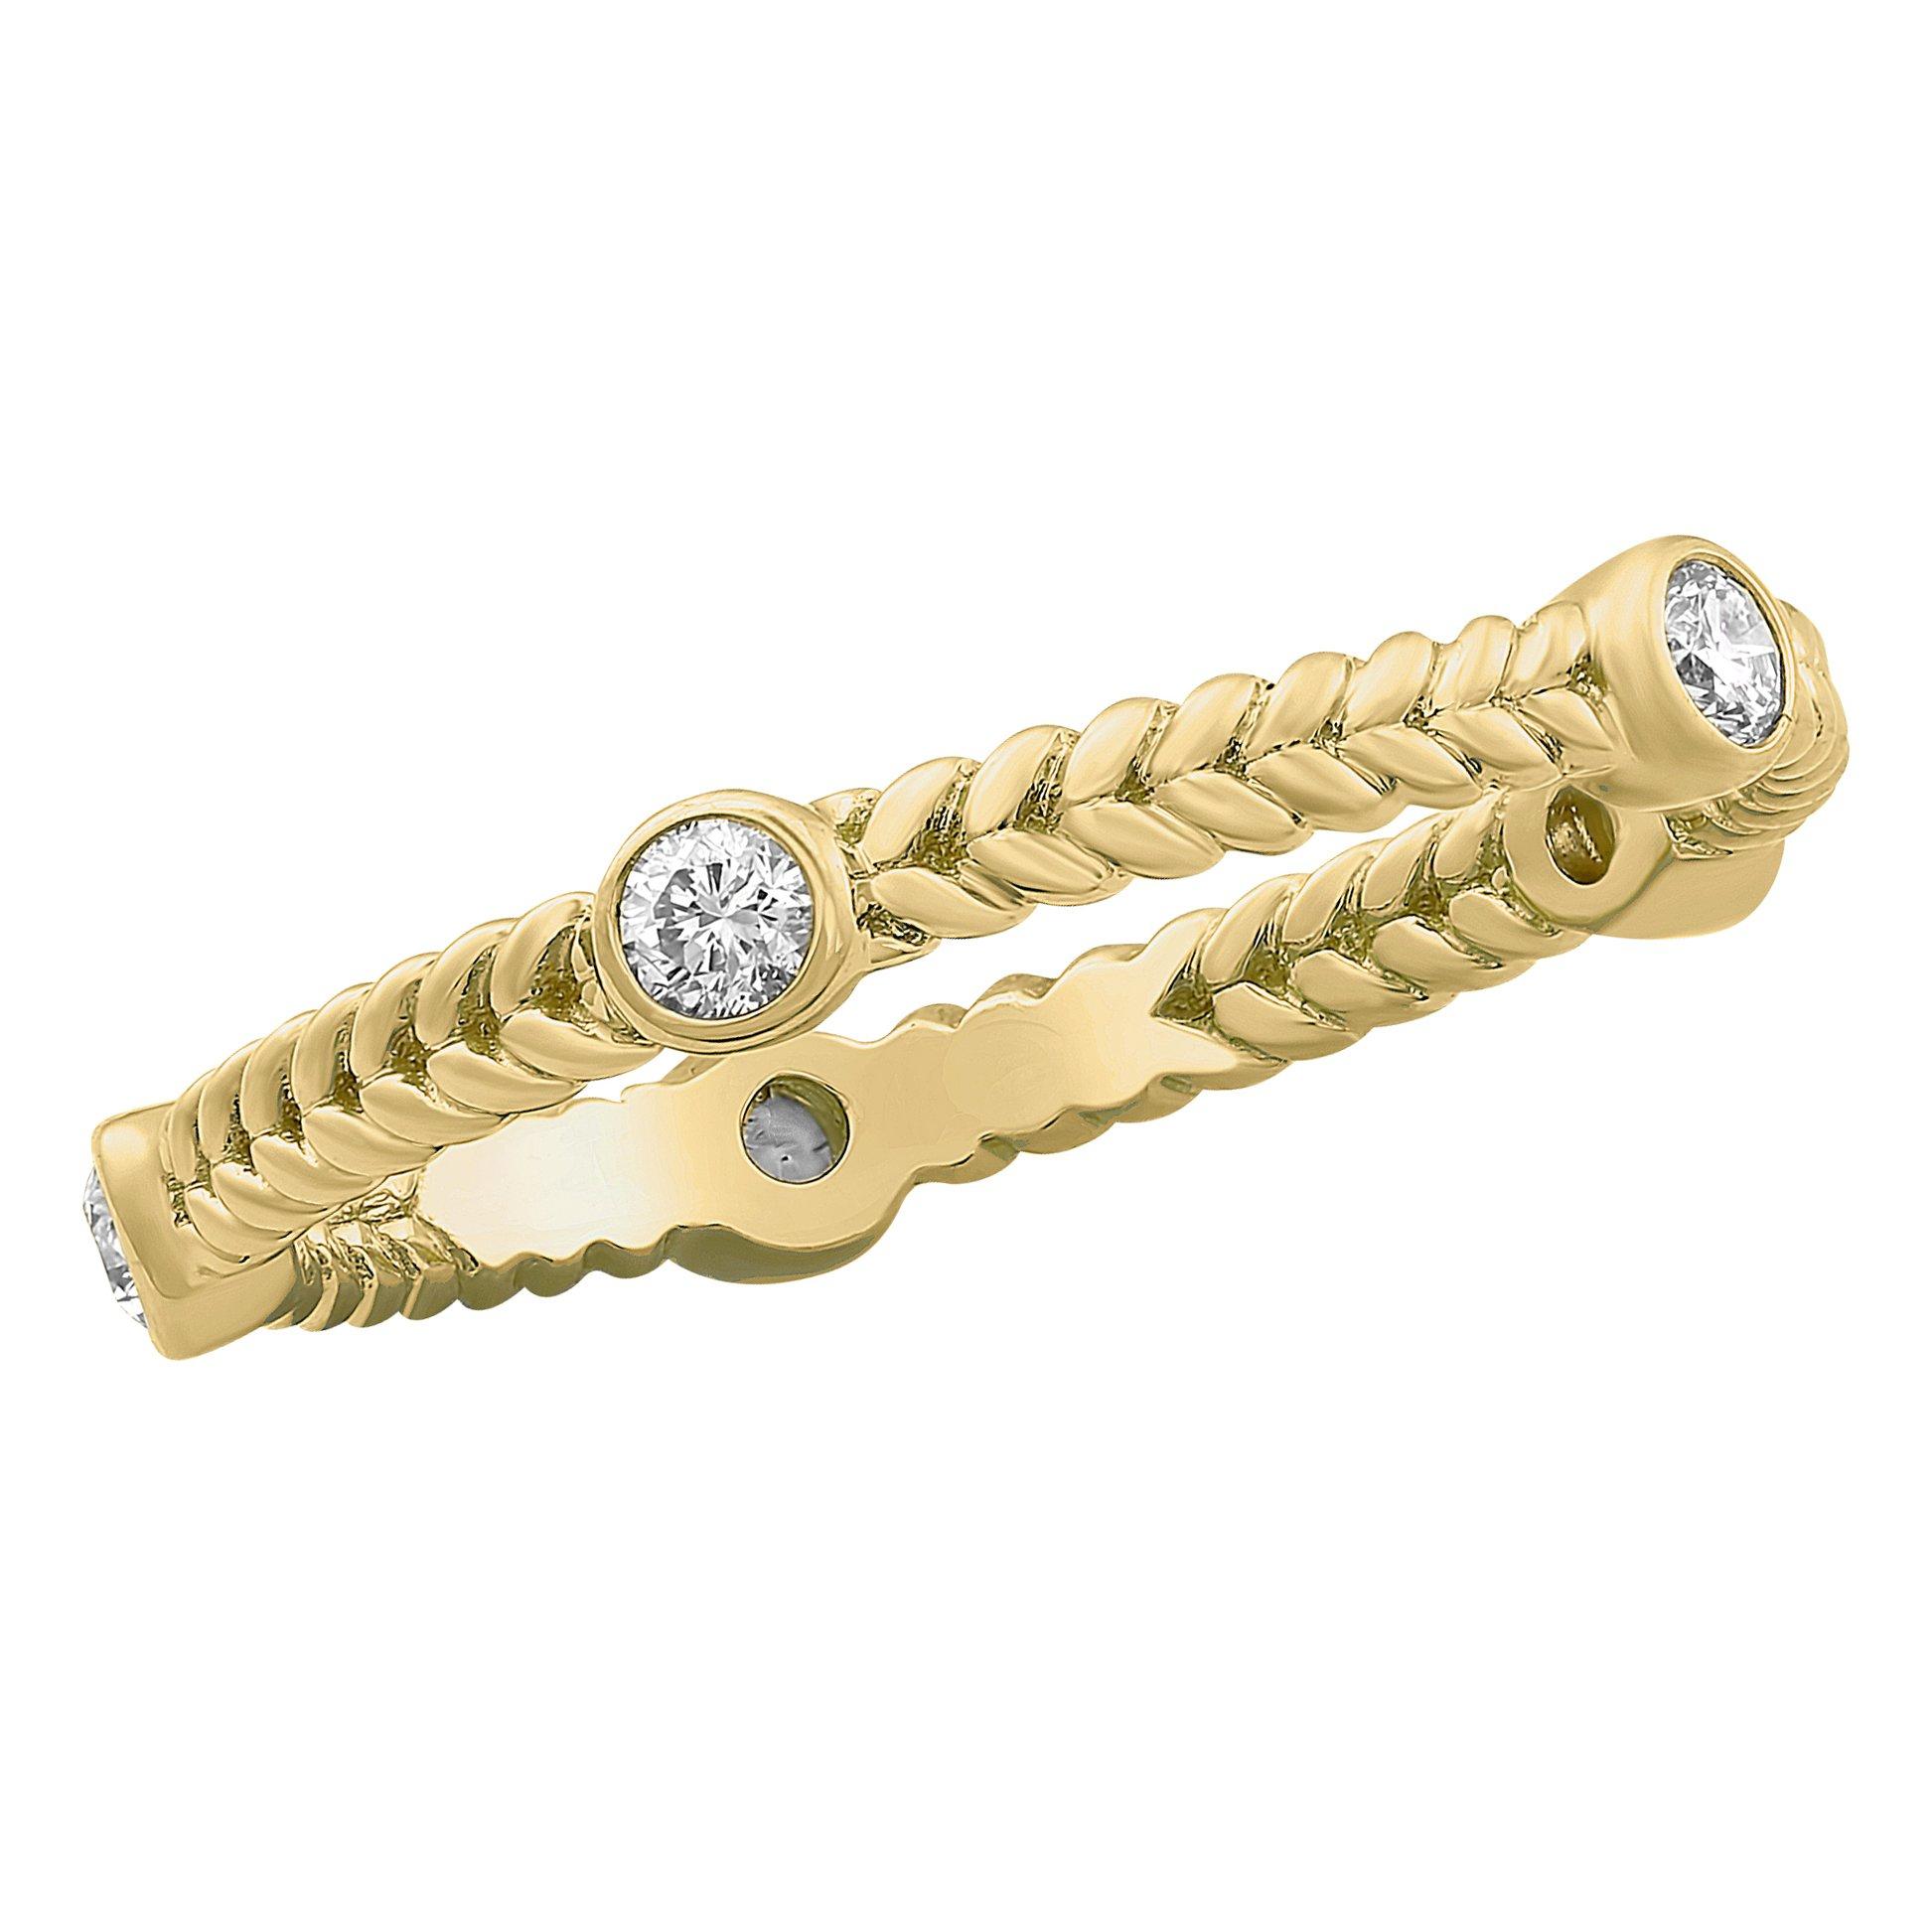 Olivia Paris 14k Yellow Gold Bezel Set Eternity Stackable Diamond Ring (1/4 cttw, H-I Color, I1 Clarity) Size 7